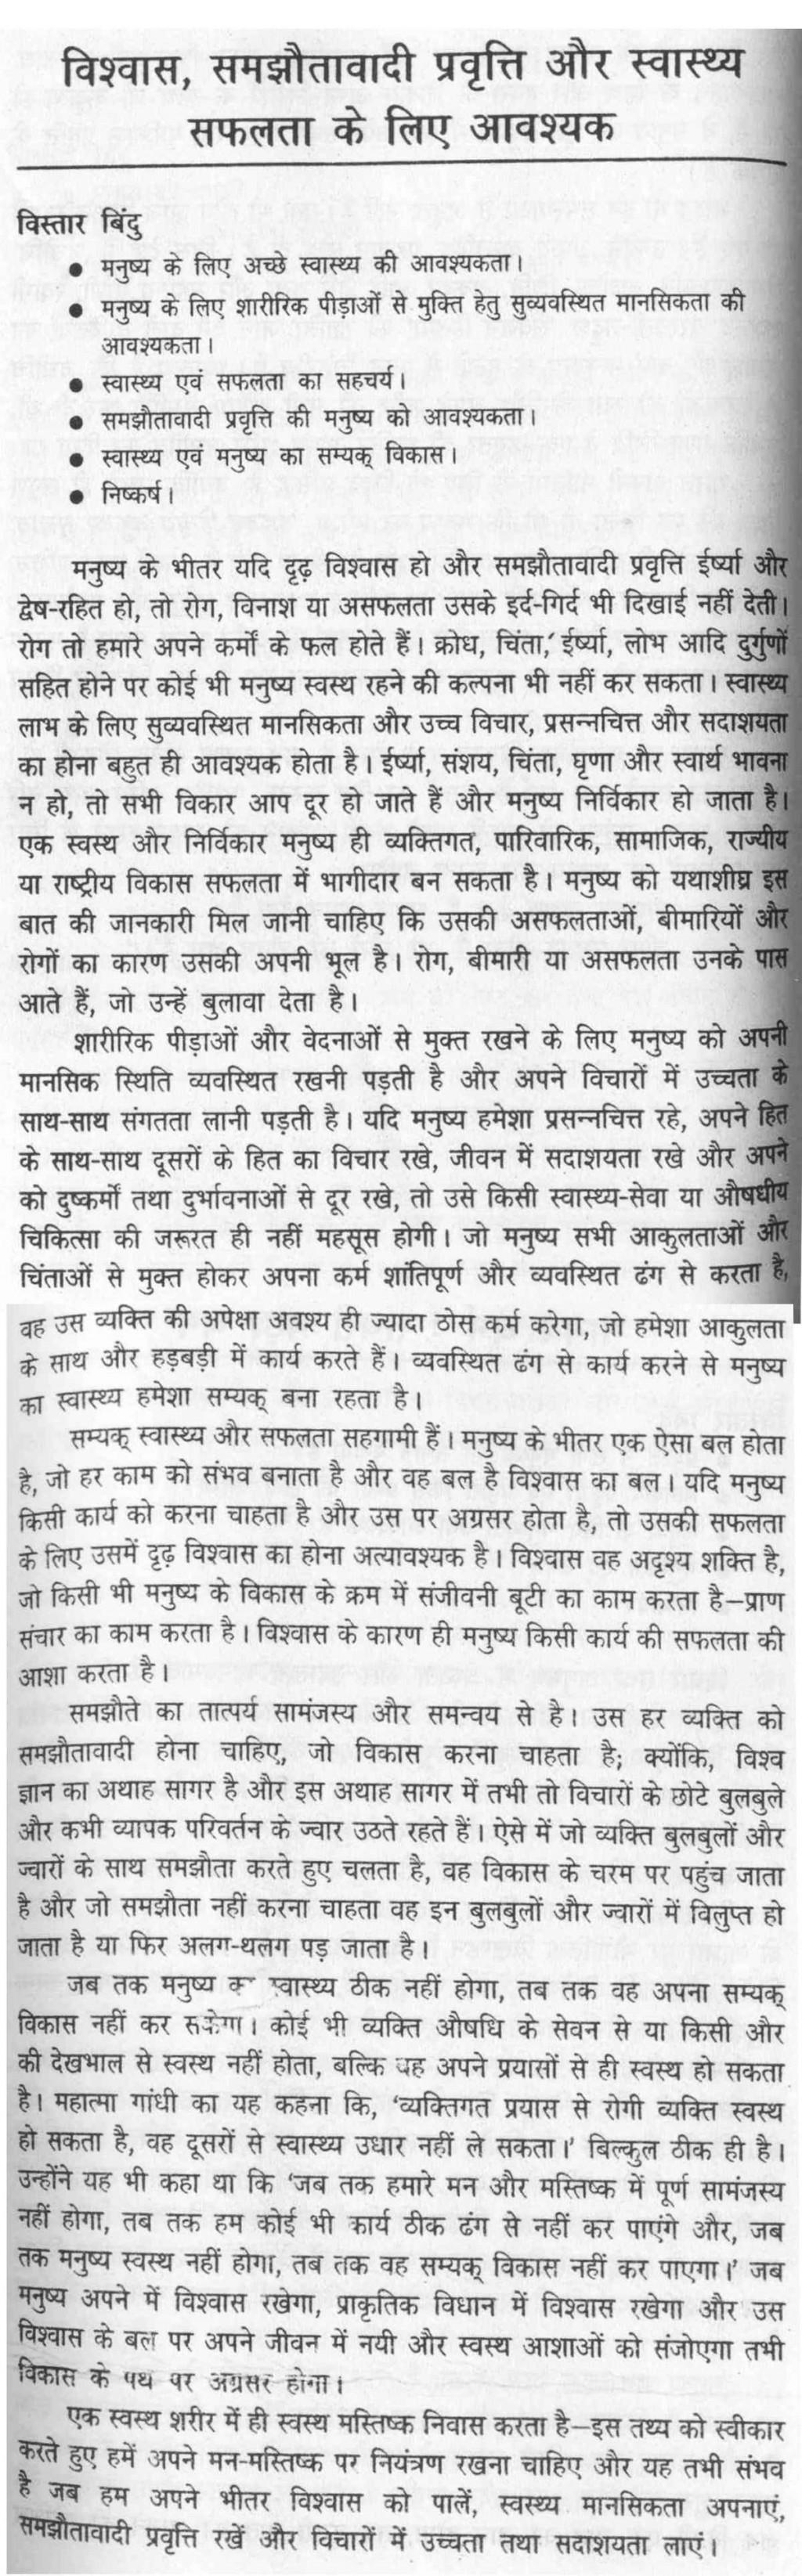 004 Success Essay 10085 Thumb Wonderful Outline Formula In Hindi Education Is Key To Large